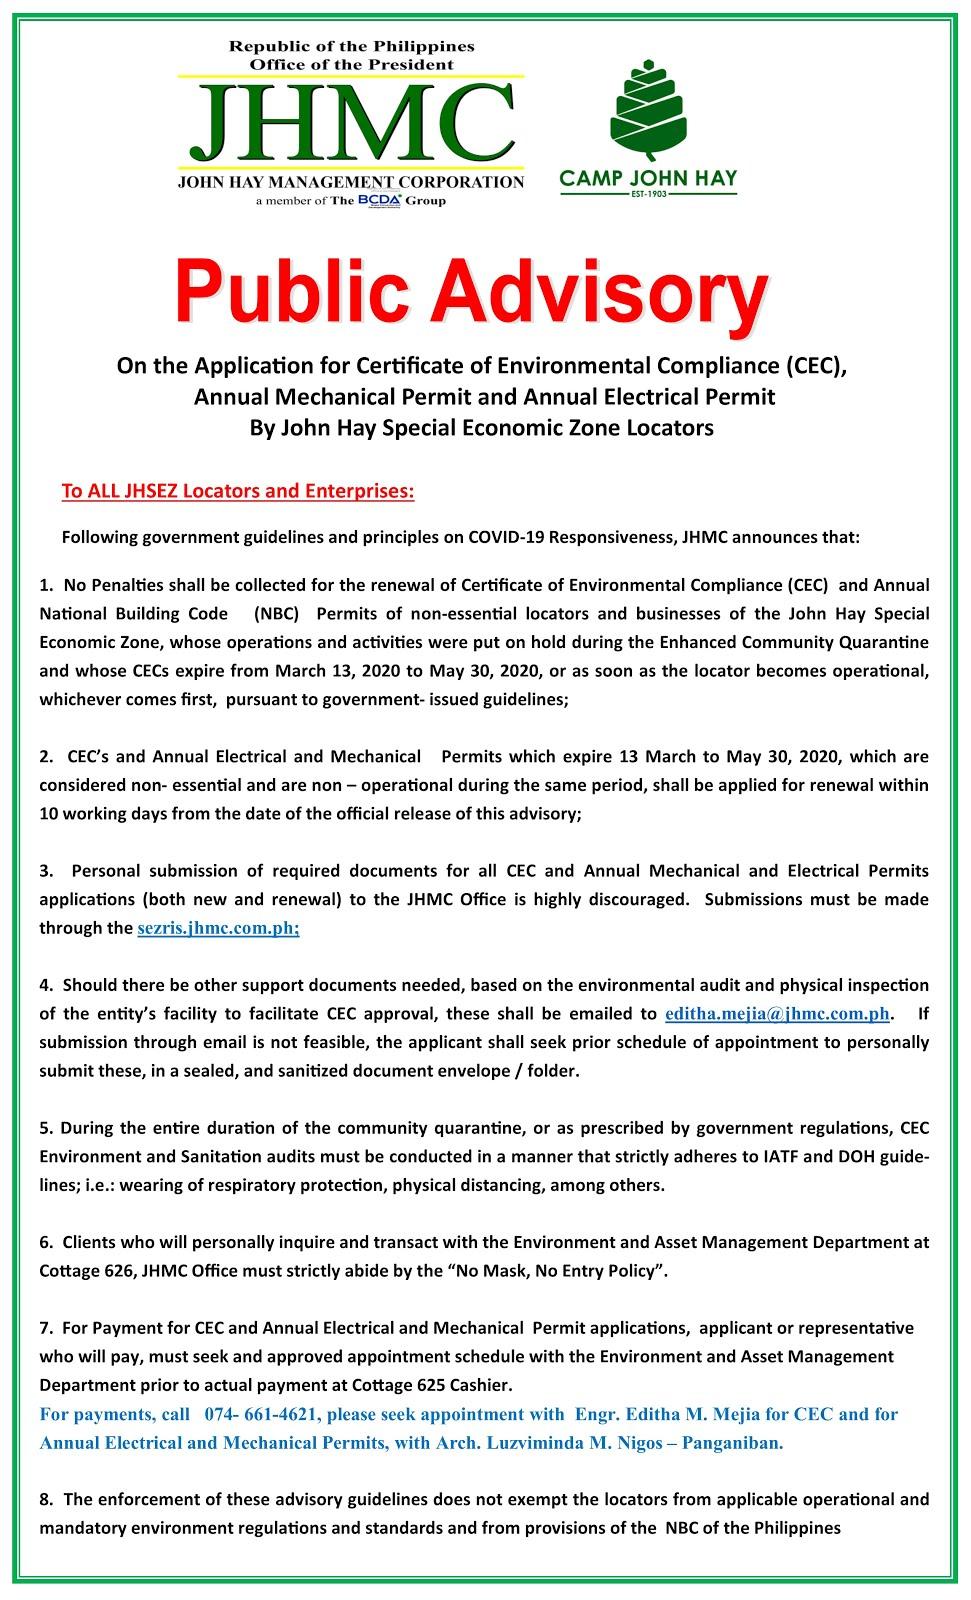 JHMC Public Advisory